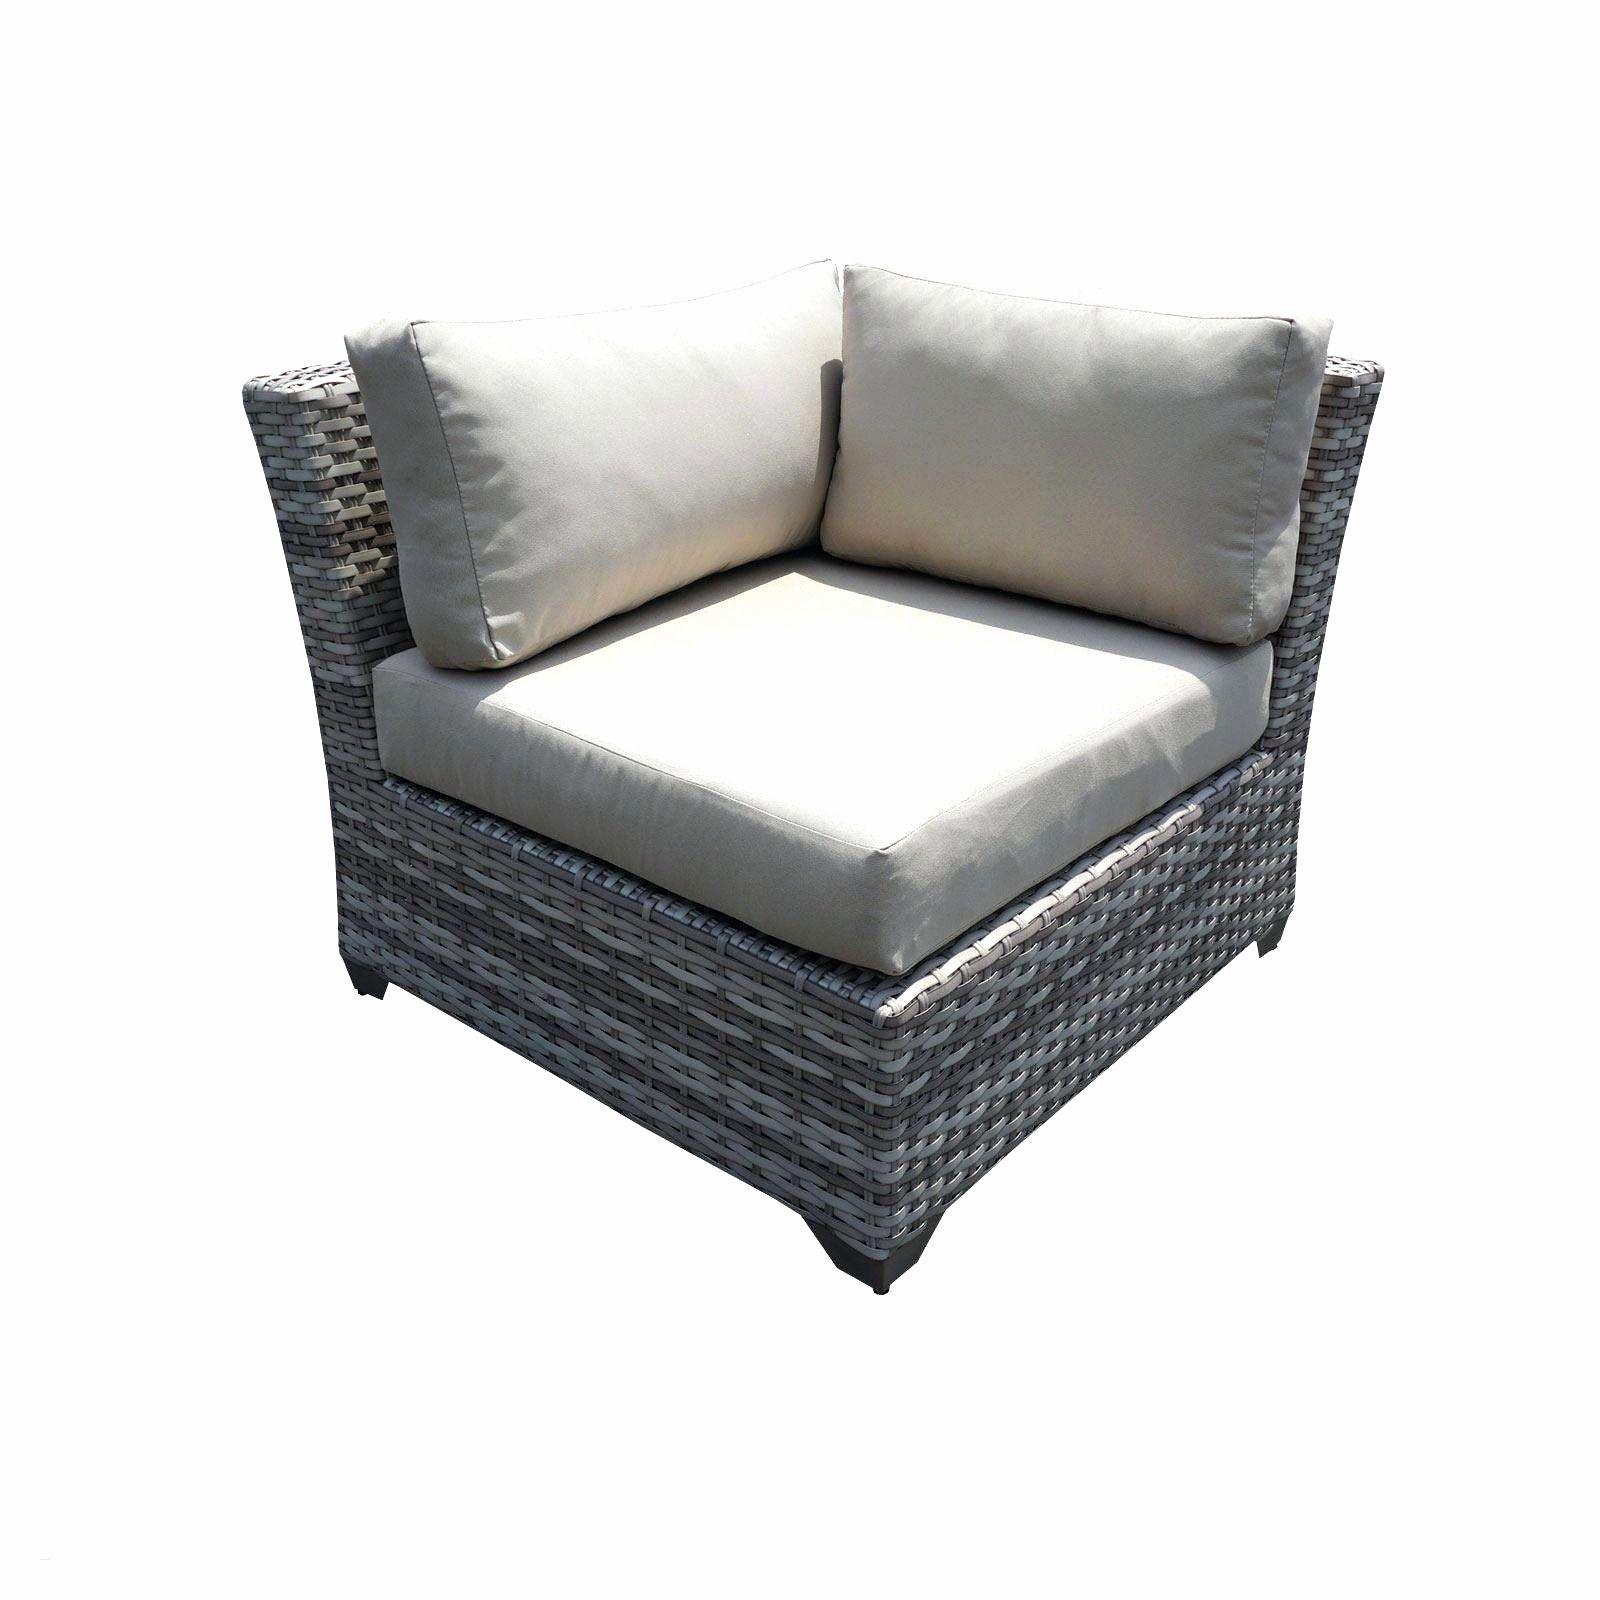 23 Beste Von Costco Sofa Set Chaiselongue sofa